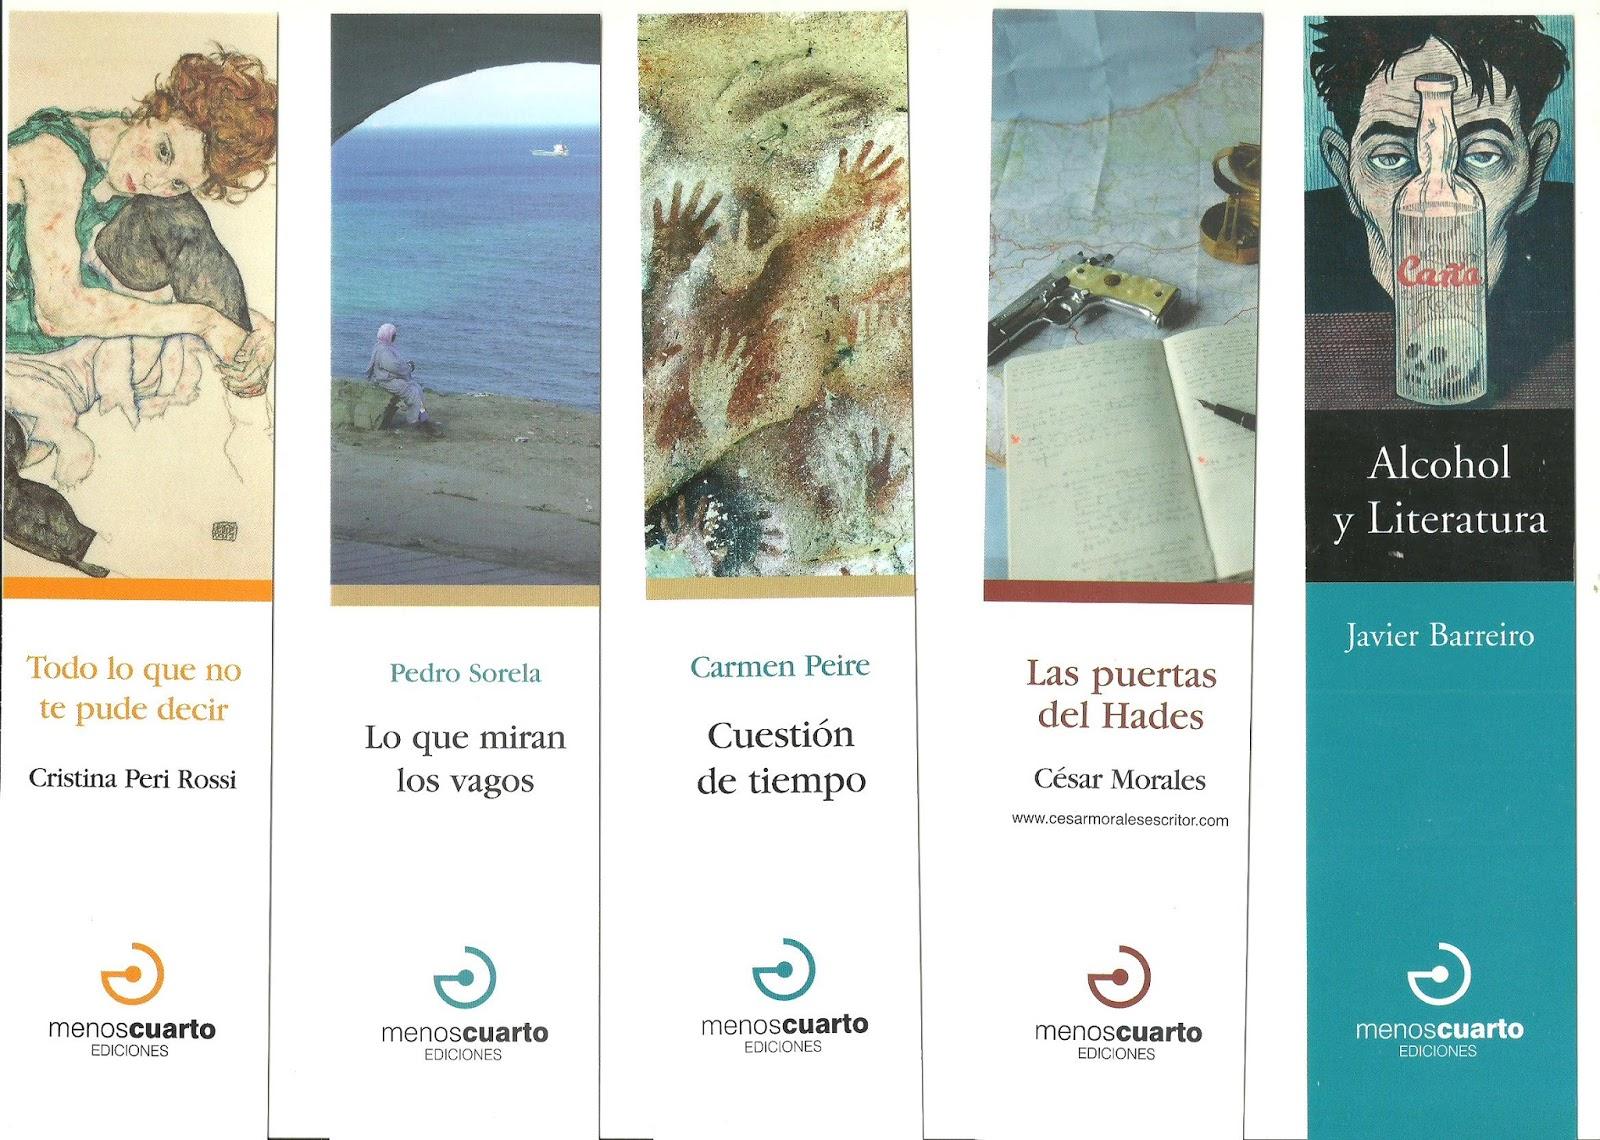 els punts de llibre: EDITORIAL MENOS CUARTO_2